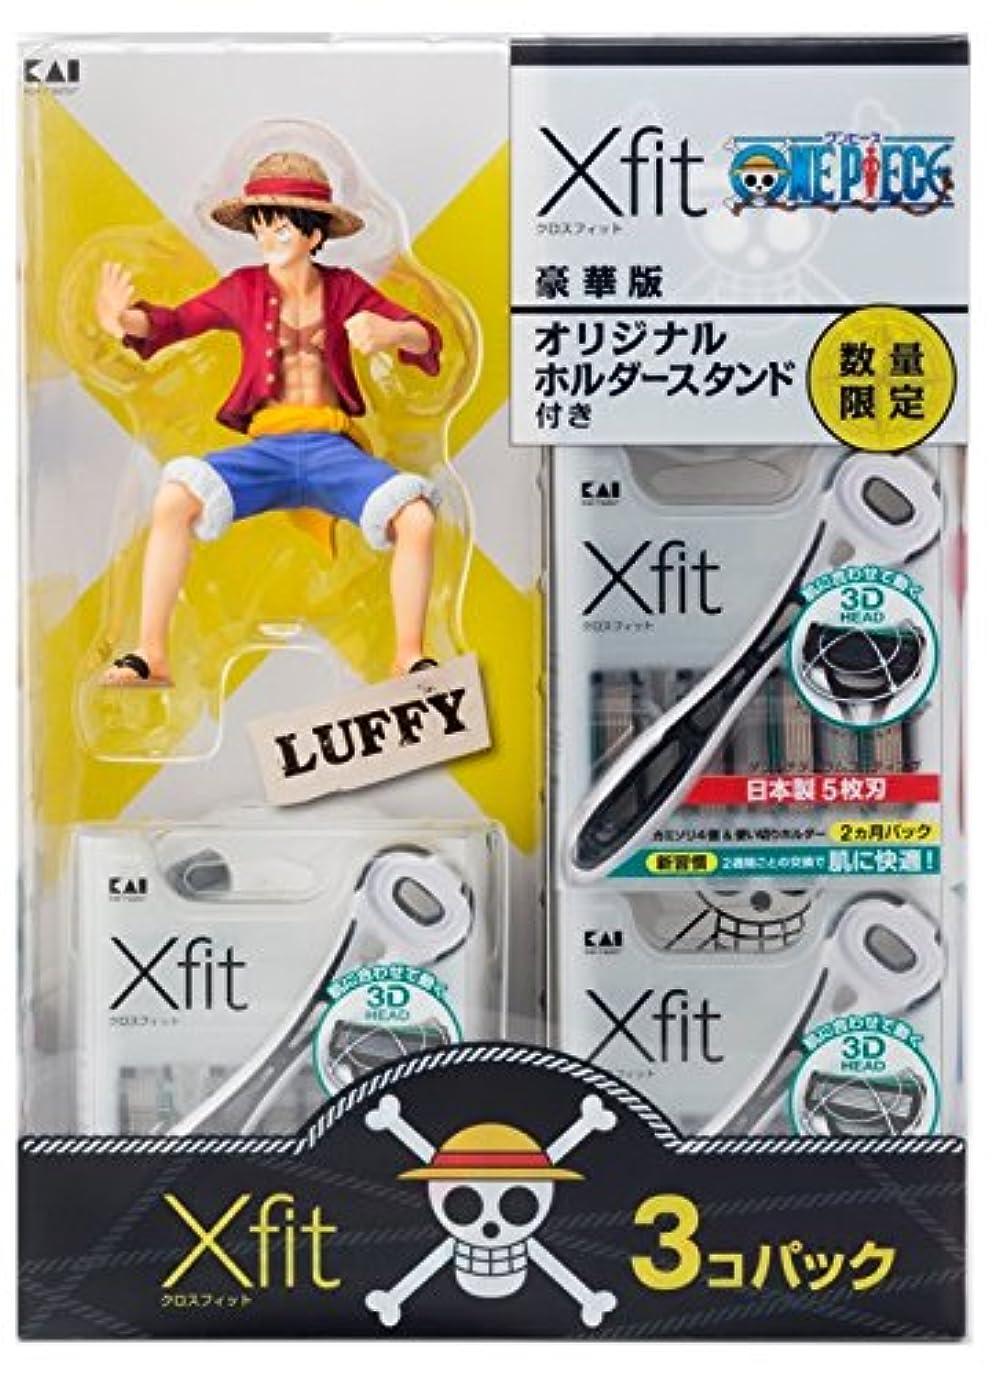 Xfit(クロスフィット)5枚刃カミソリ ワンピース企画第1弾3コパック+オリジナルホルダースタンド(ルフィ)